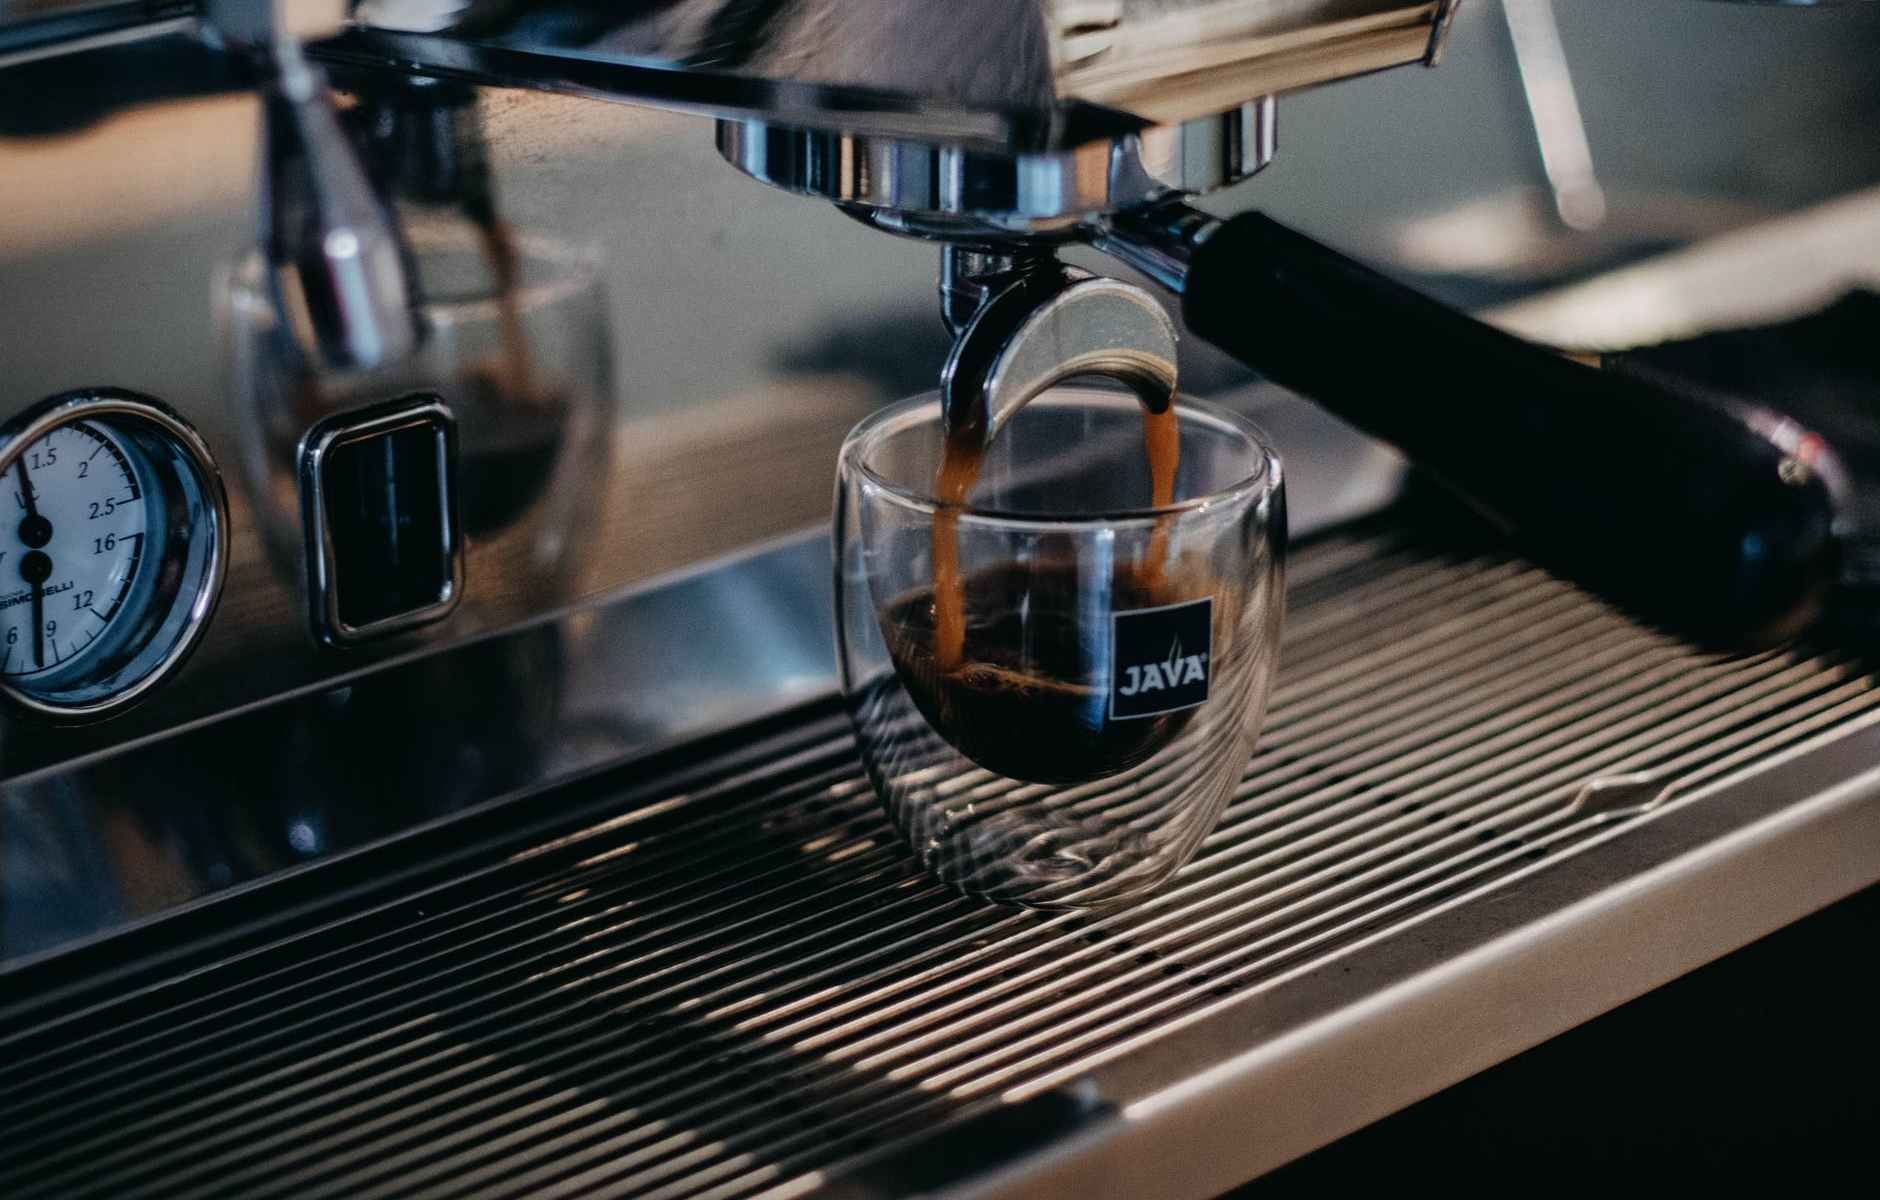 coffee machine brewing hot espresso